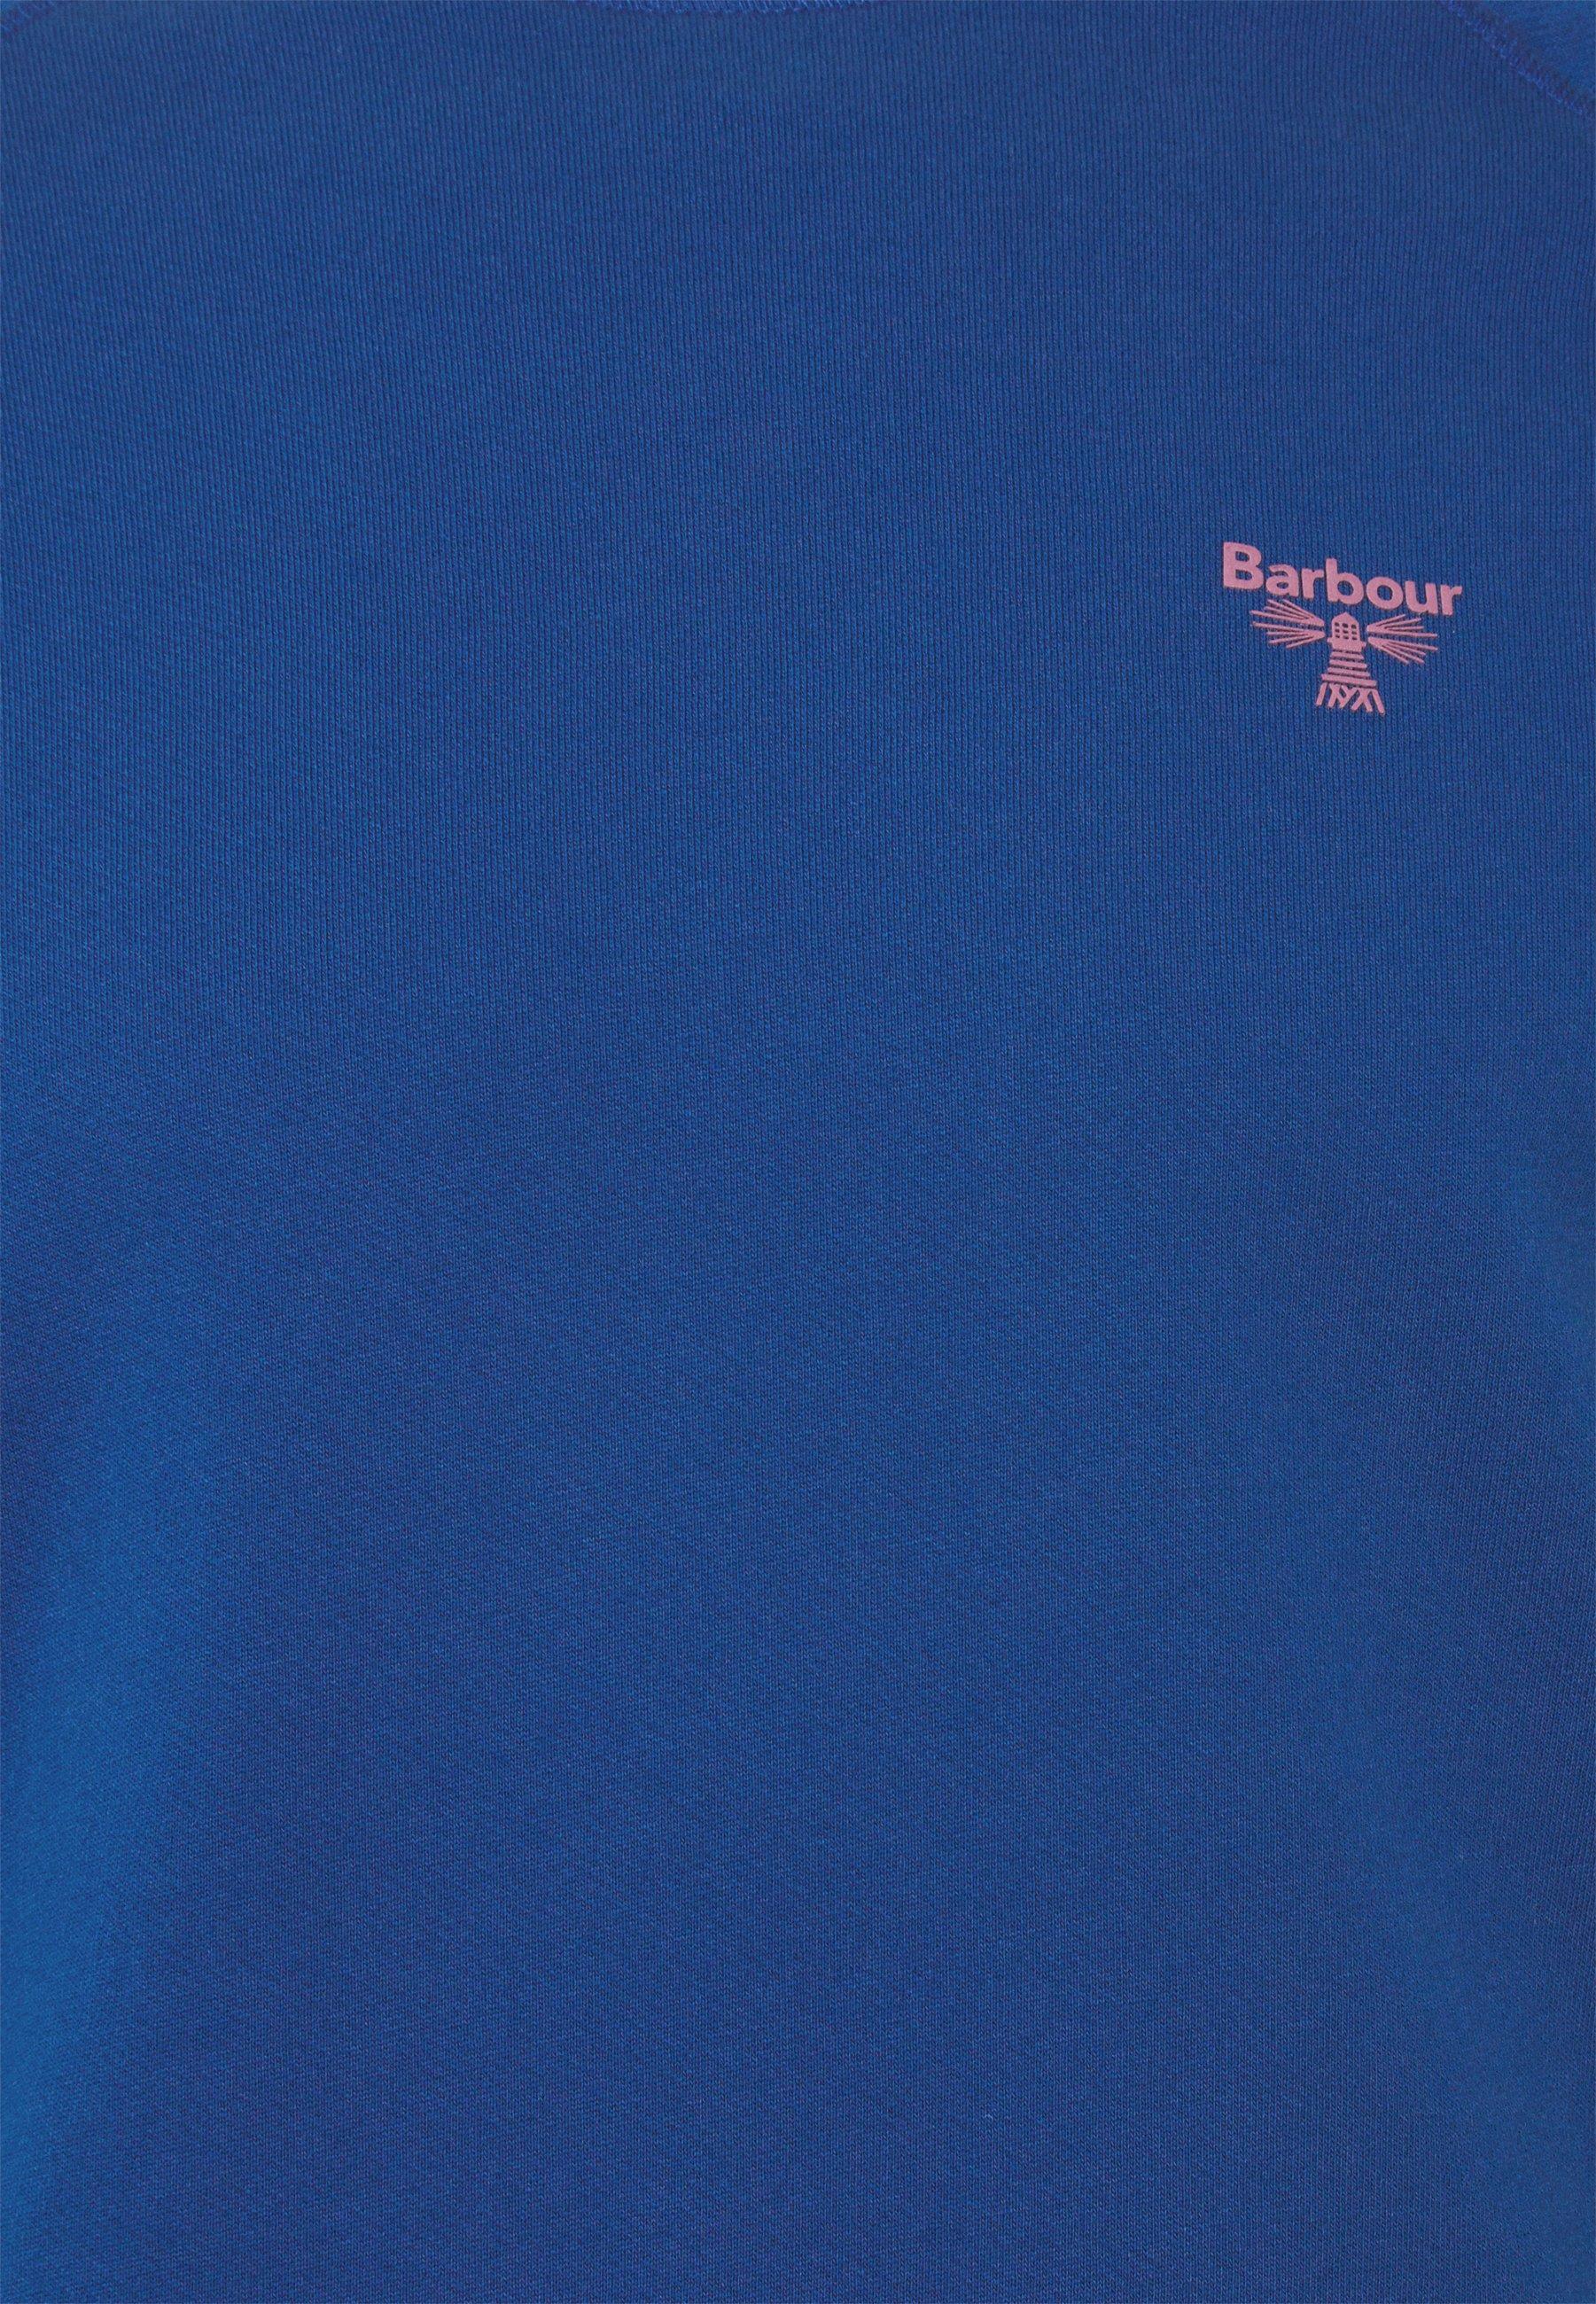 Pepe Jeans DYLAN - Stickad tröja - dark ocean/mörkblå - Herr Vinterkläder 4T0MY